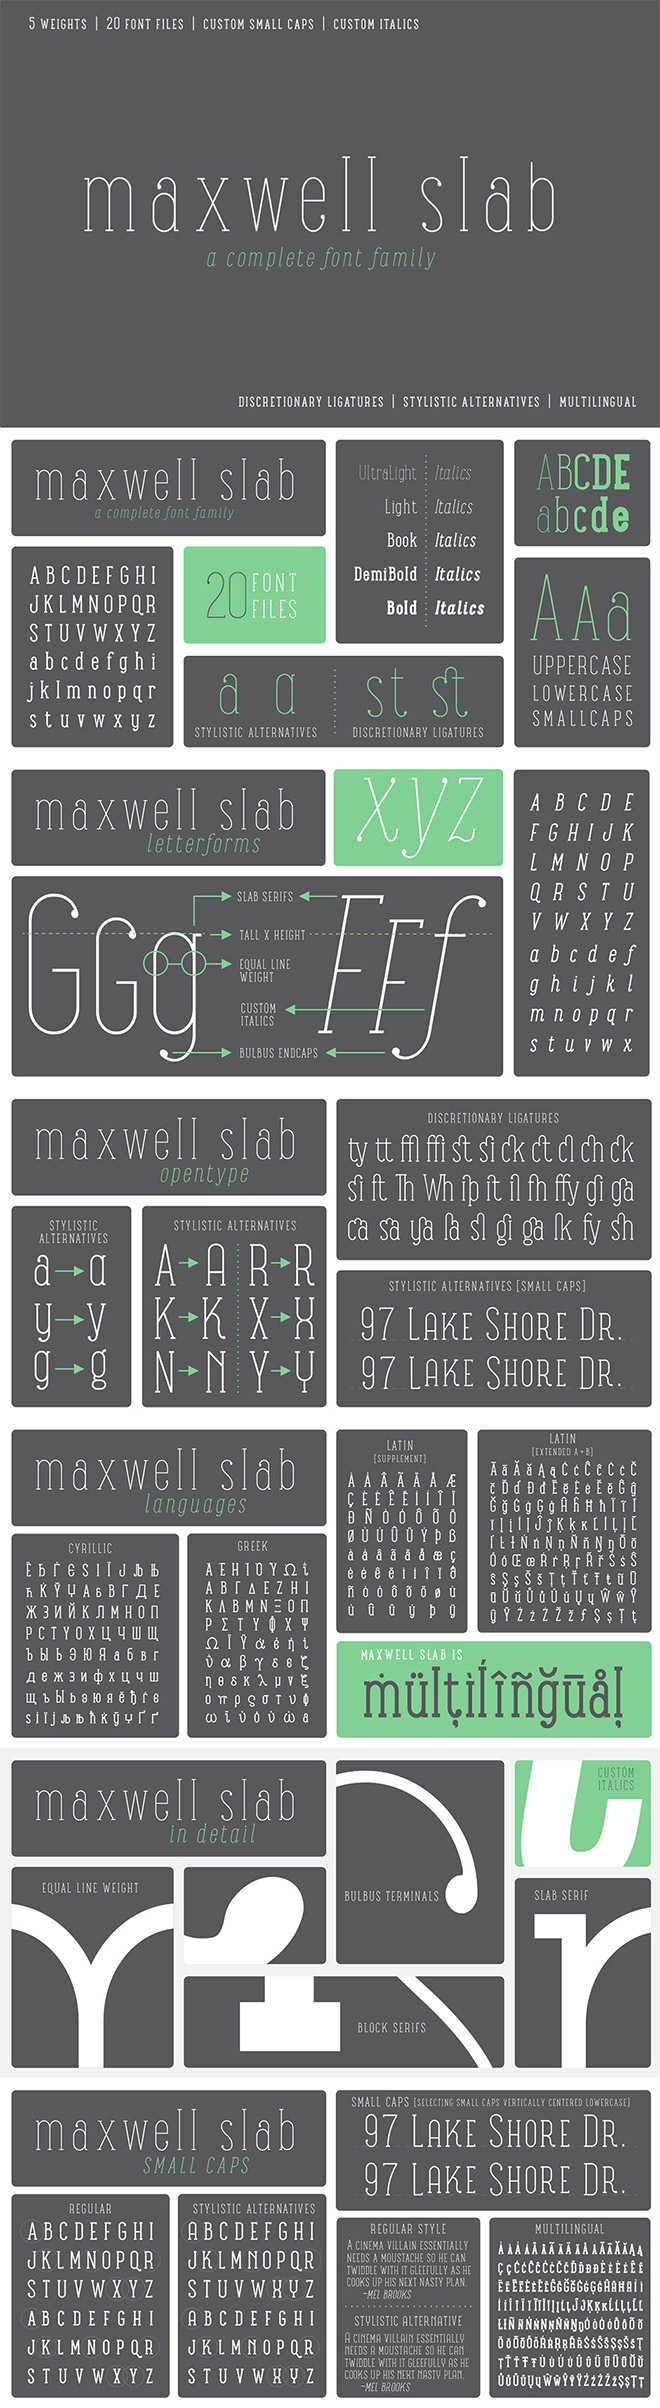 Maxwell Slab